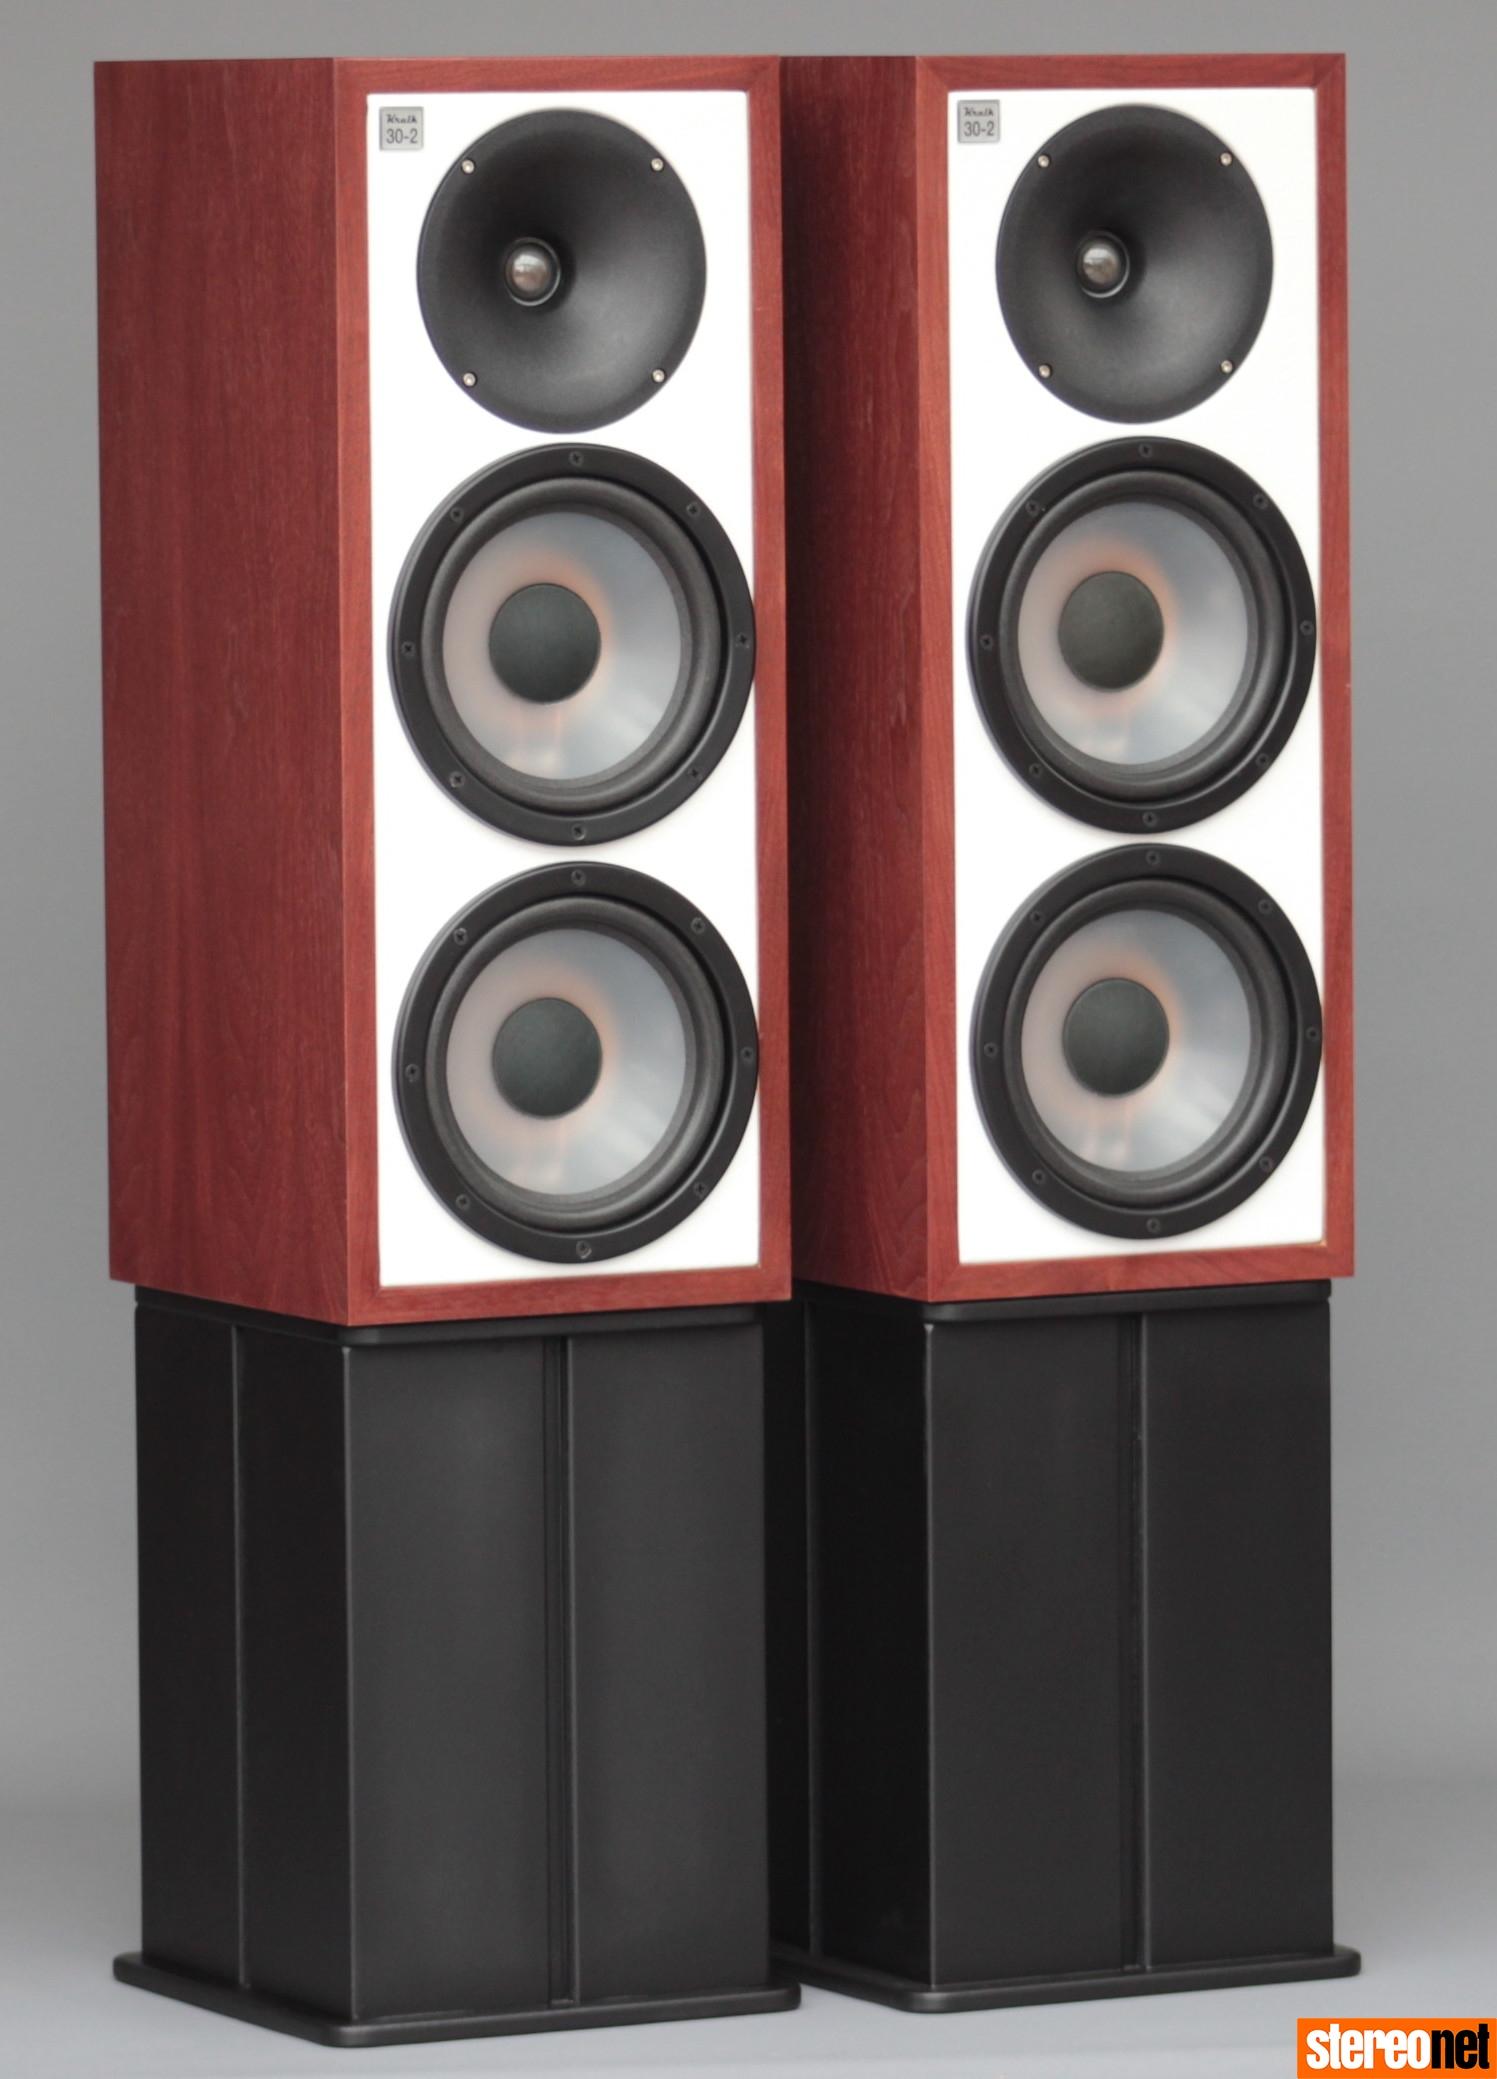 Kralk Audio 30-2